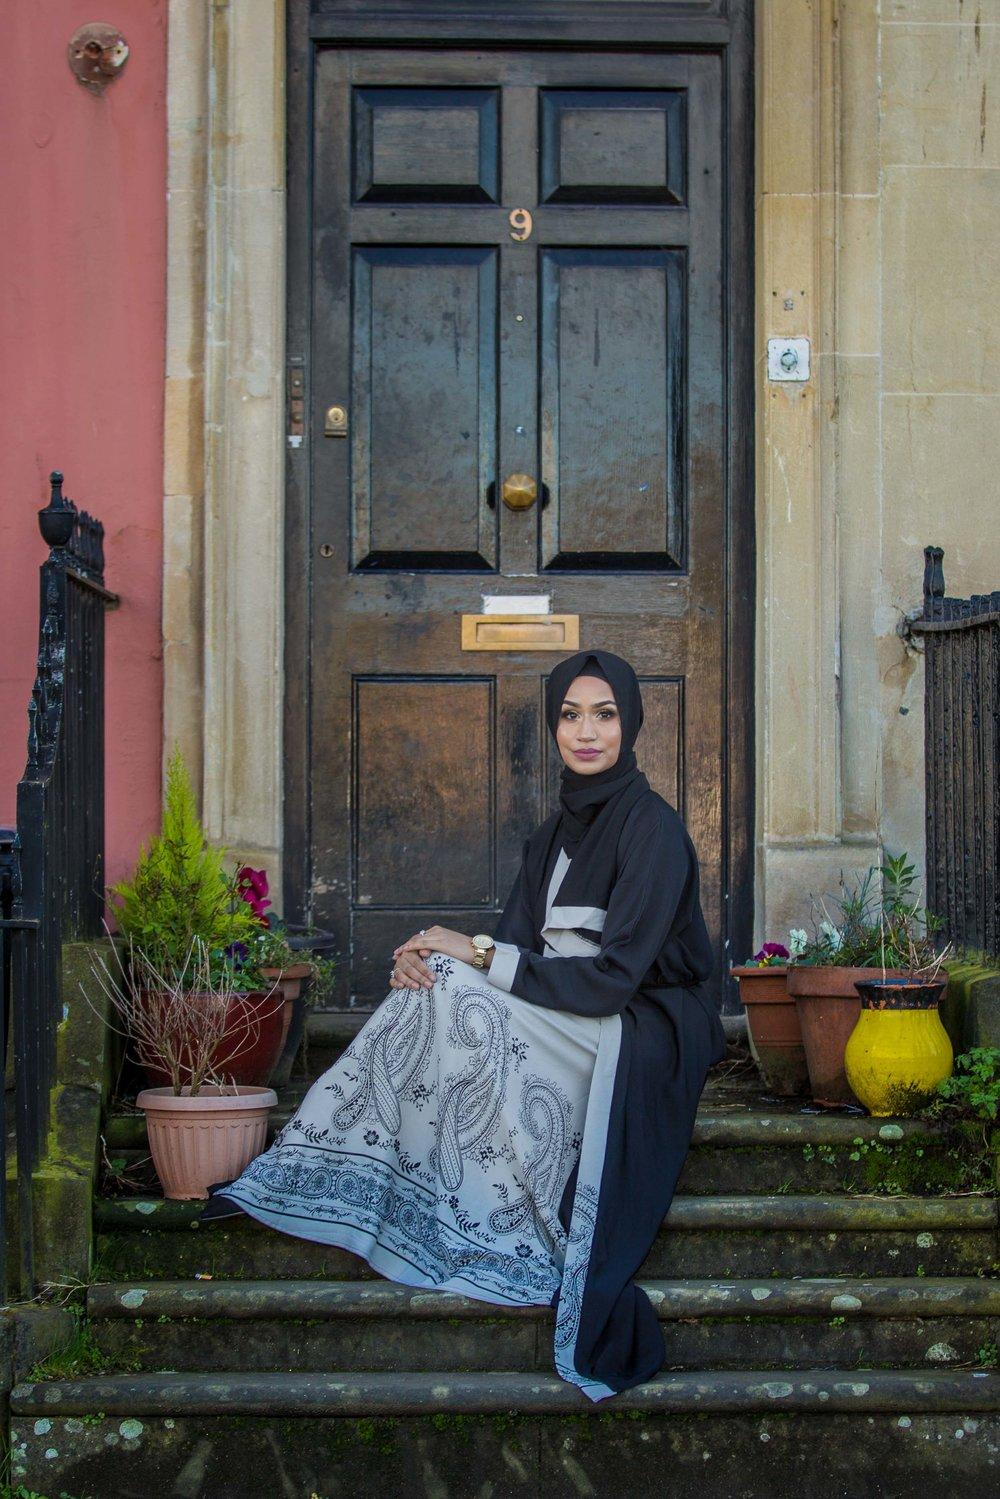 modest-street-aisha-rahman-fashion-photography-london-bristol-natalia-smith-photography-abaya-7.jpg